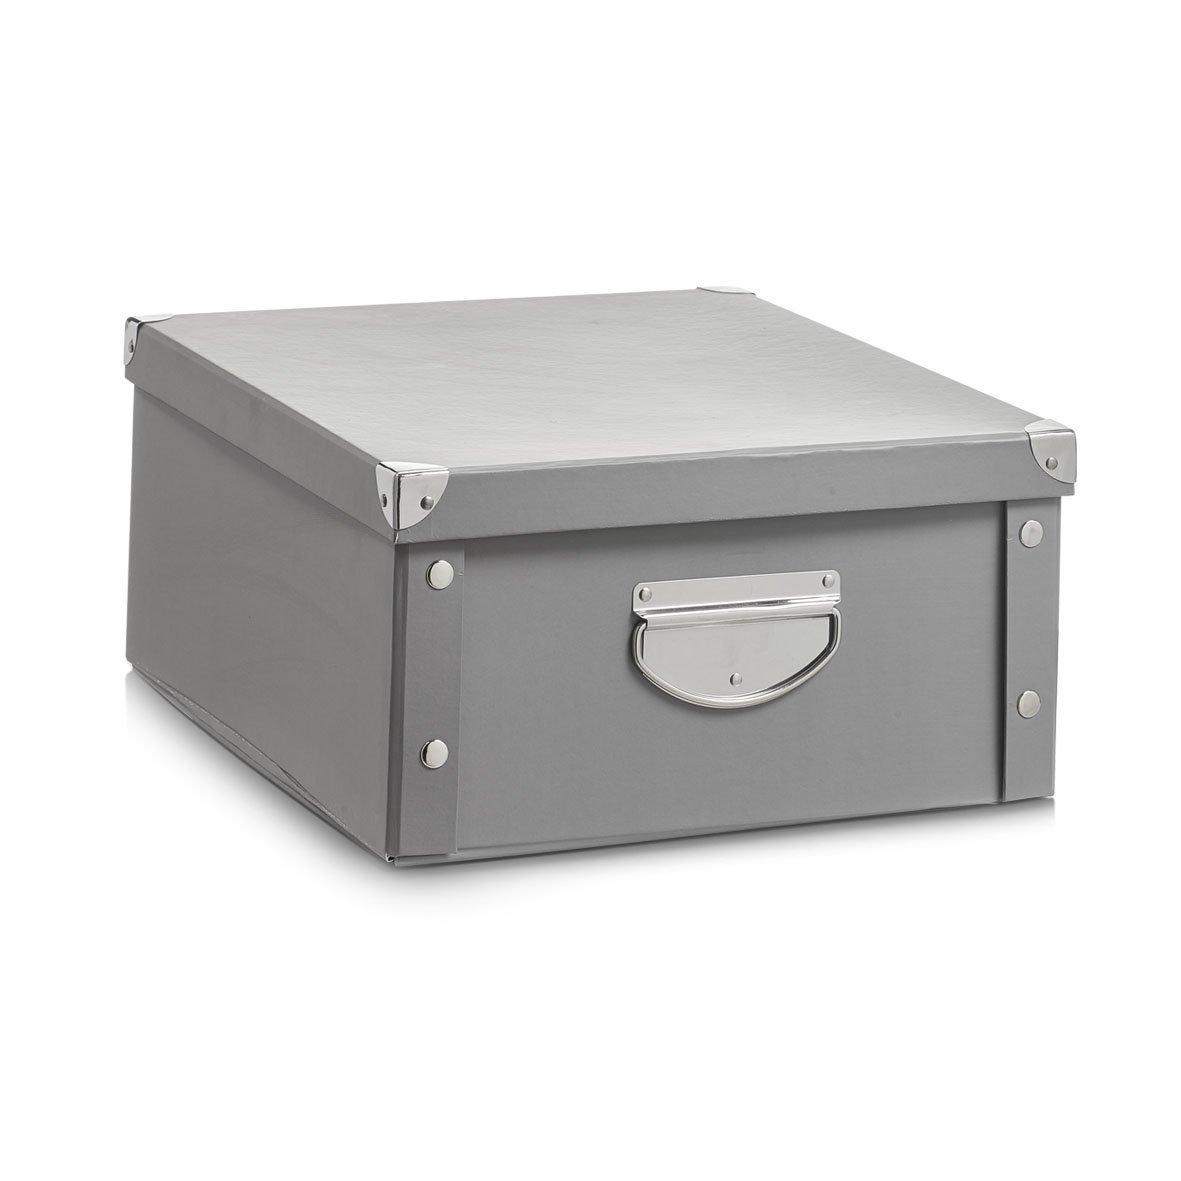 Zeller 17599 Caja de almacenaje de cartón Gris (Grau) 40 x 33 x 17 cm: Amazon.es: Hogar